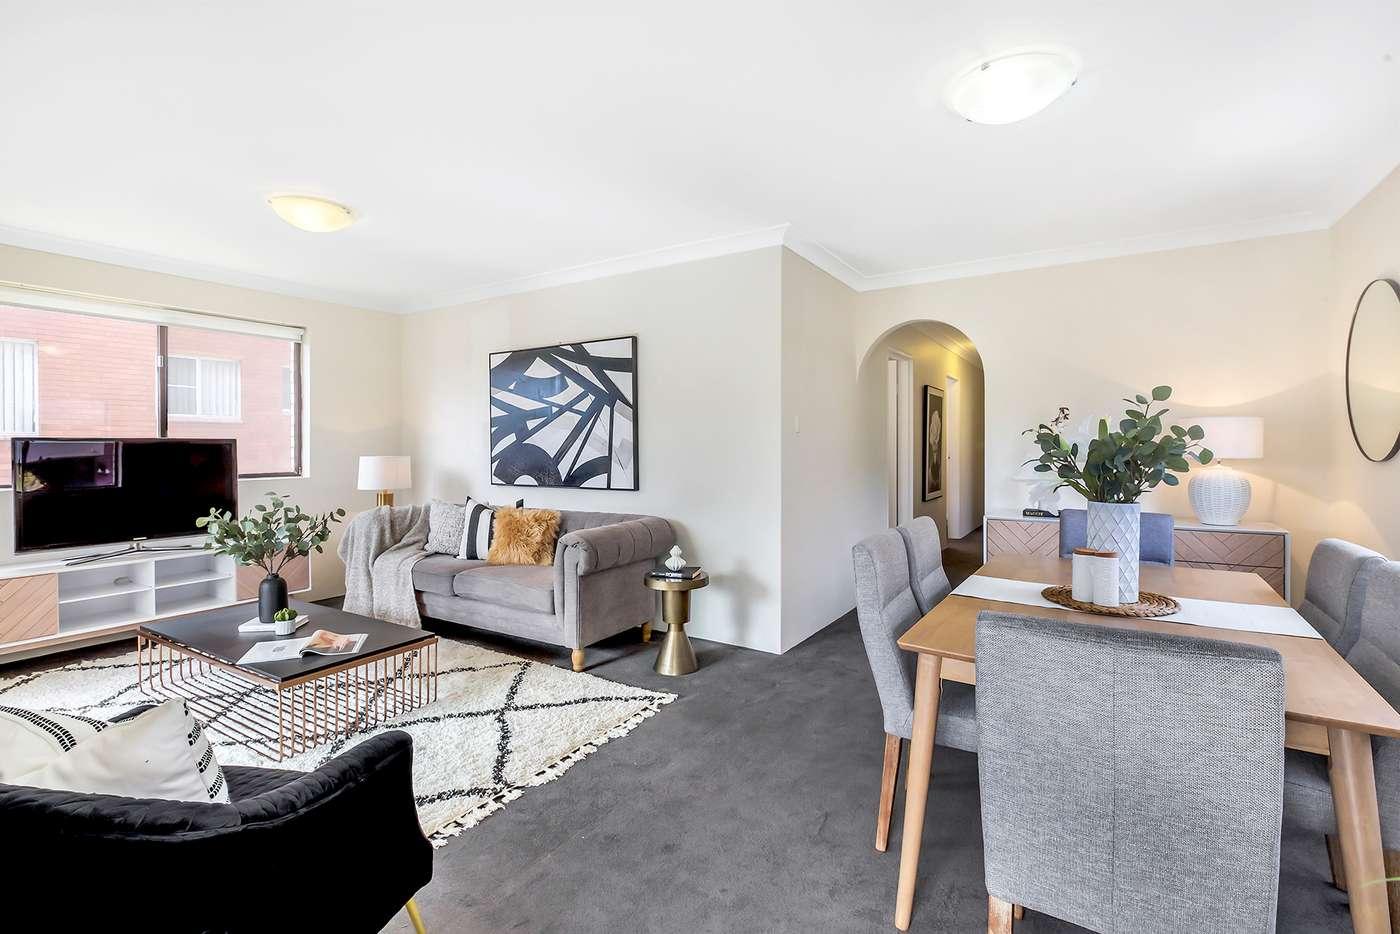 Main view of Homely apartment listing, 2/57 Kensington Road, Kensington NSW 2033